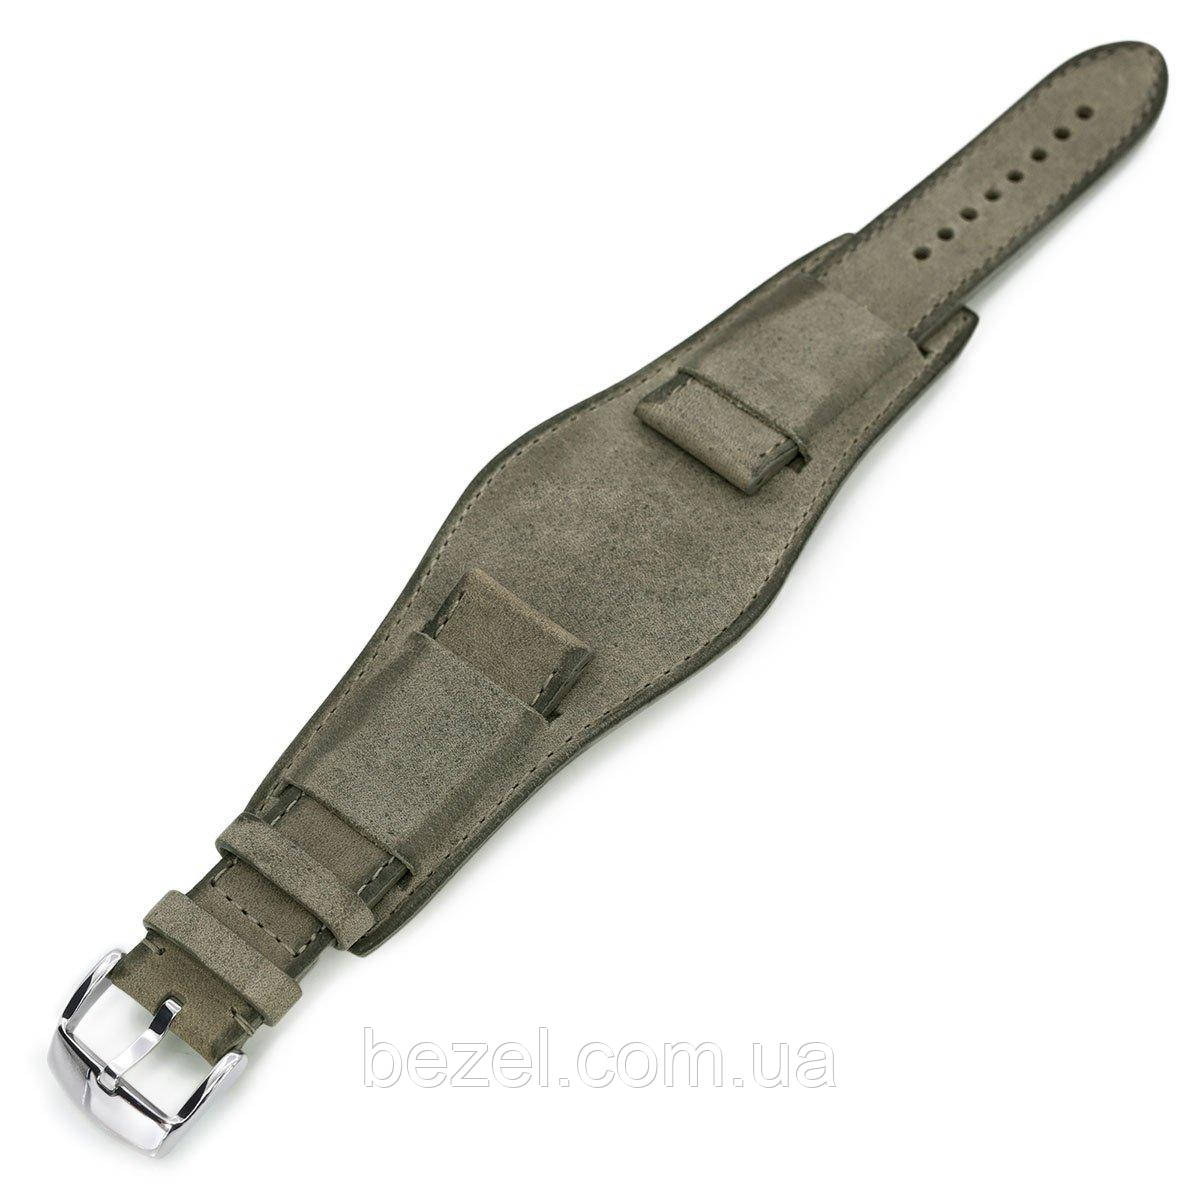 22mm Italian Handmade Bund Military Style Double-layer Watch Strap, Khaki Grey